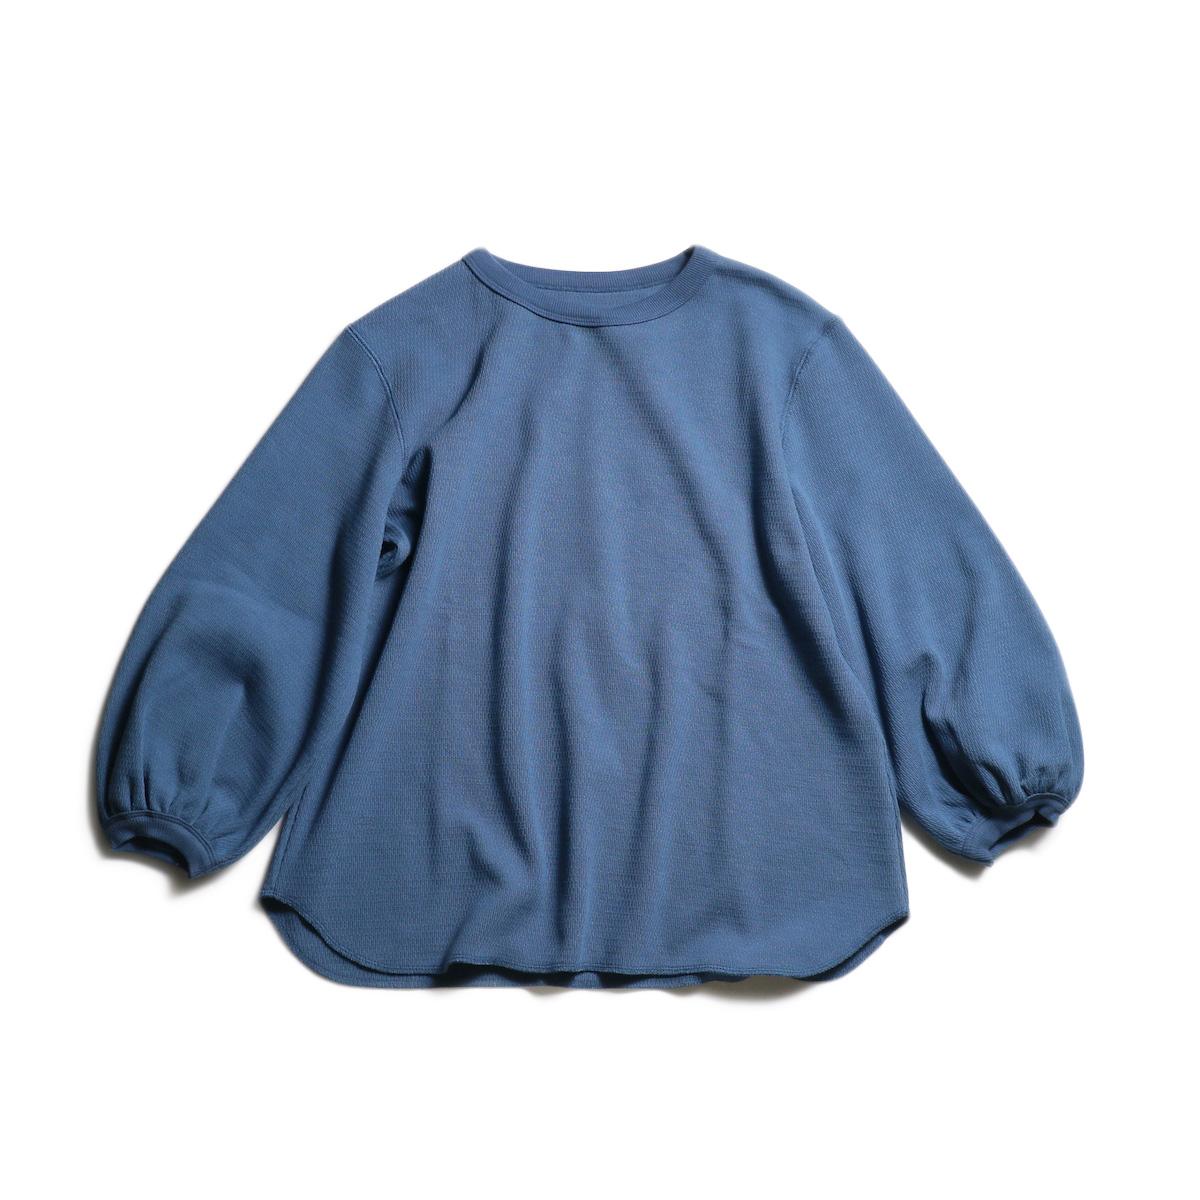 BLUEBIRD BOULEVARD / ハニカムベアサーマルトップ (D.Blue)